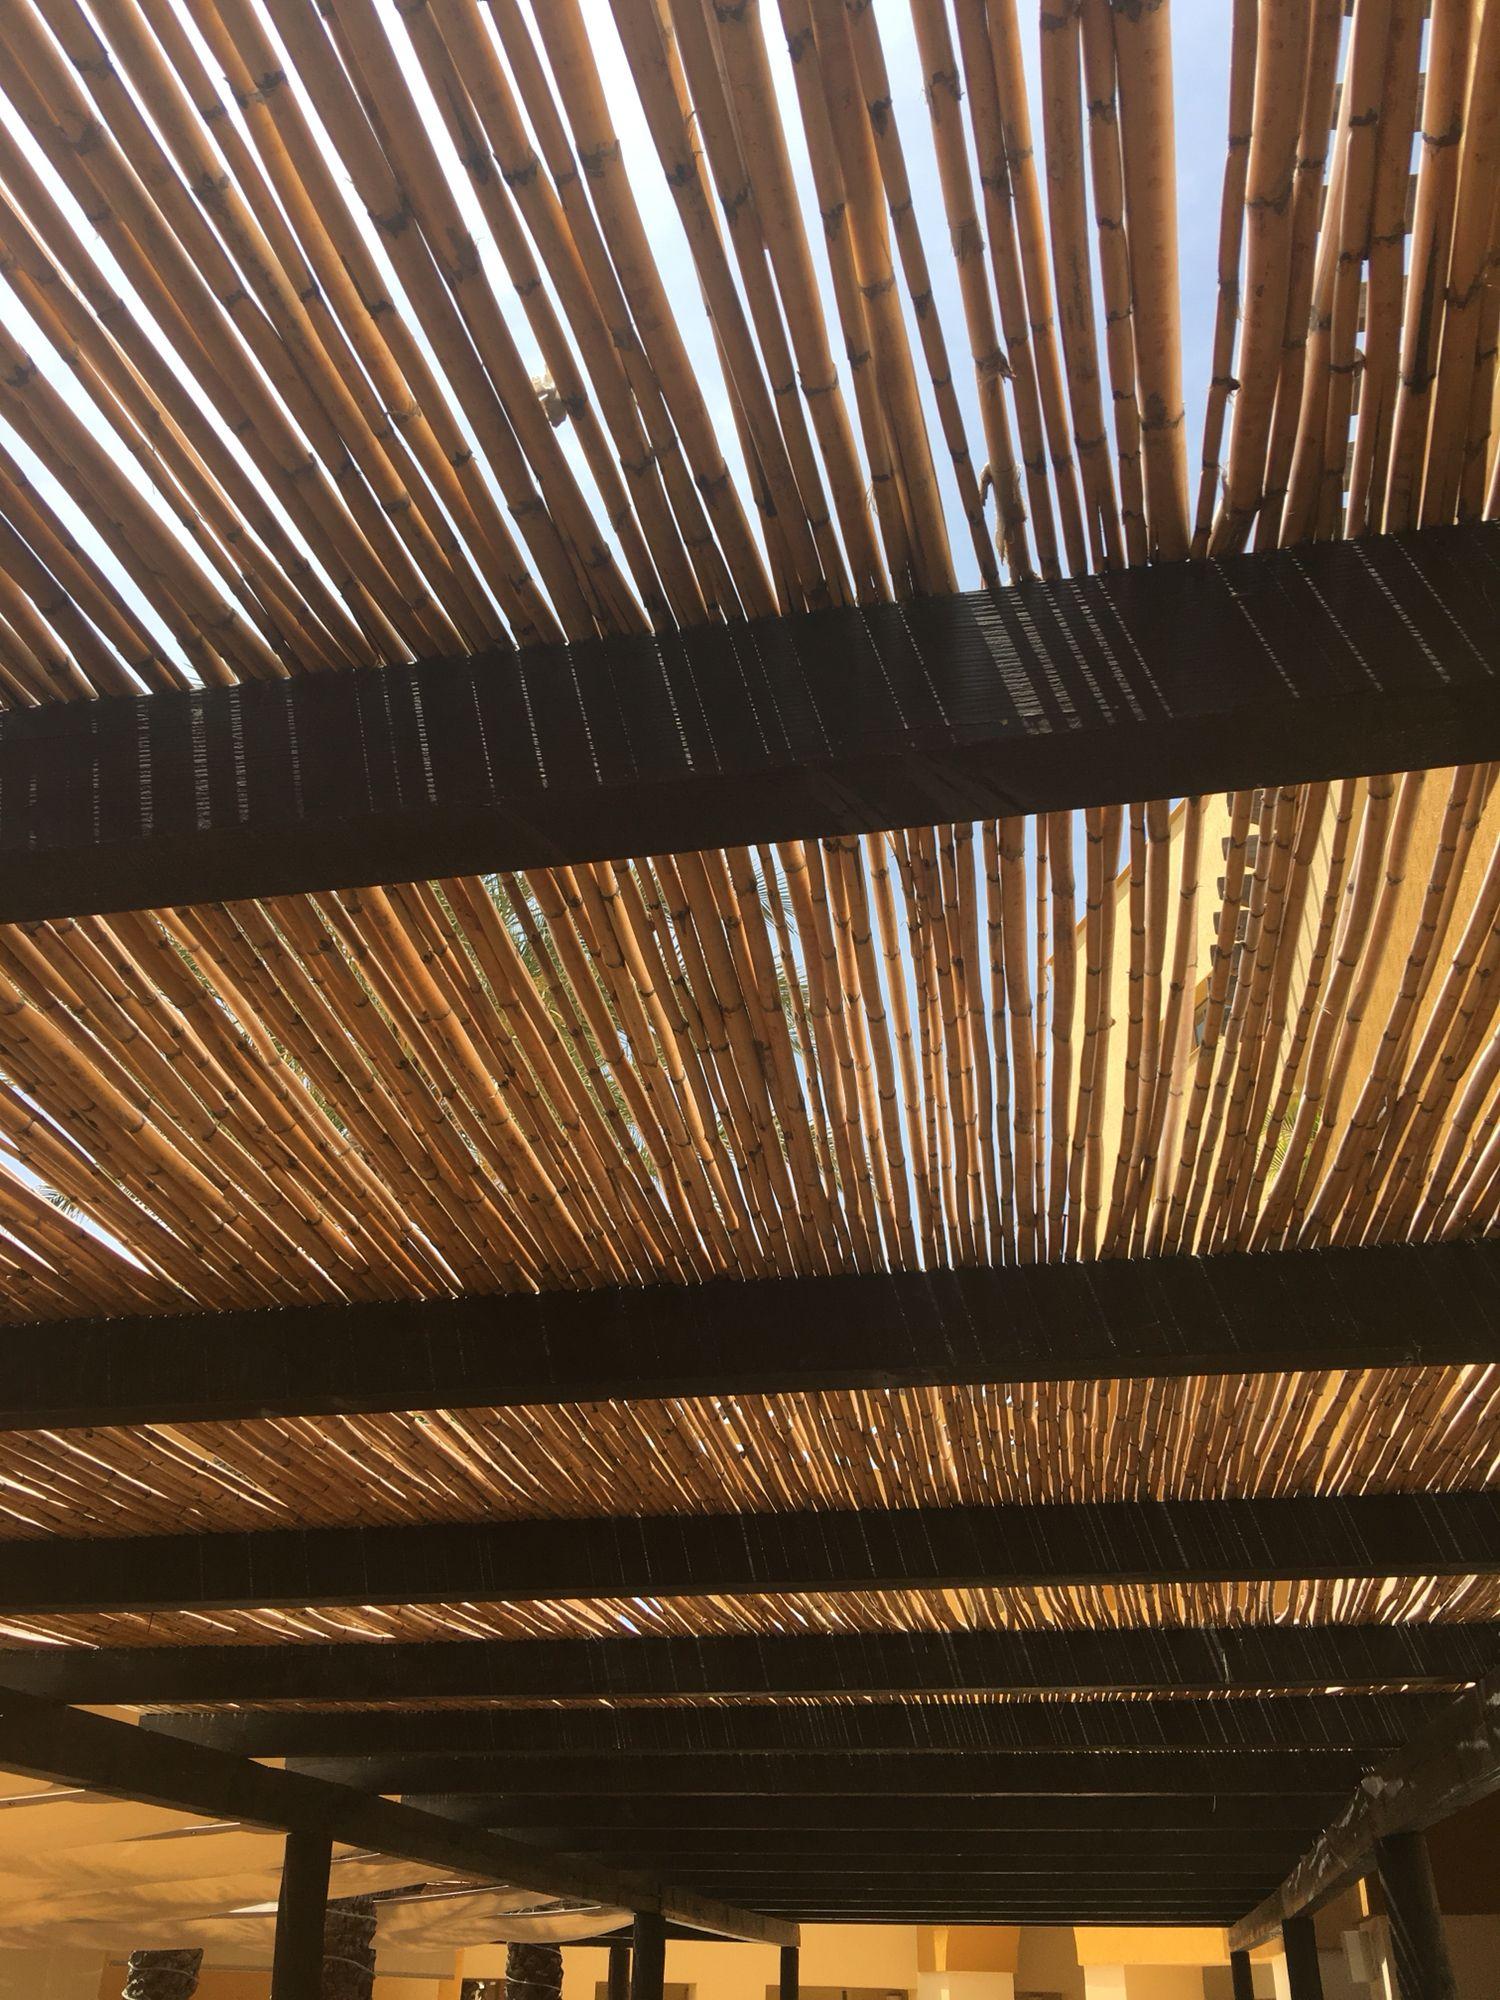 Bamboo Ceiling Pergola Cabo Bamboo Ceiling Pergola Ceiling